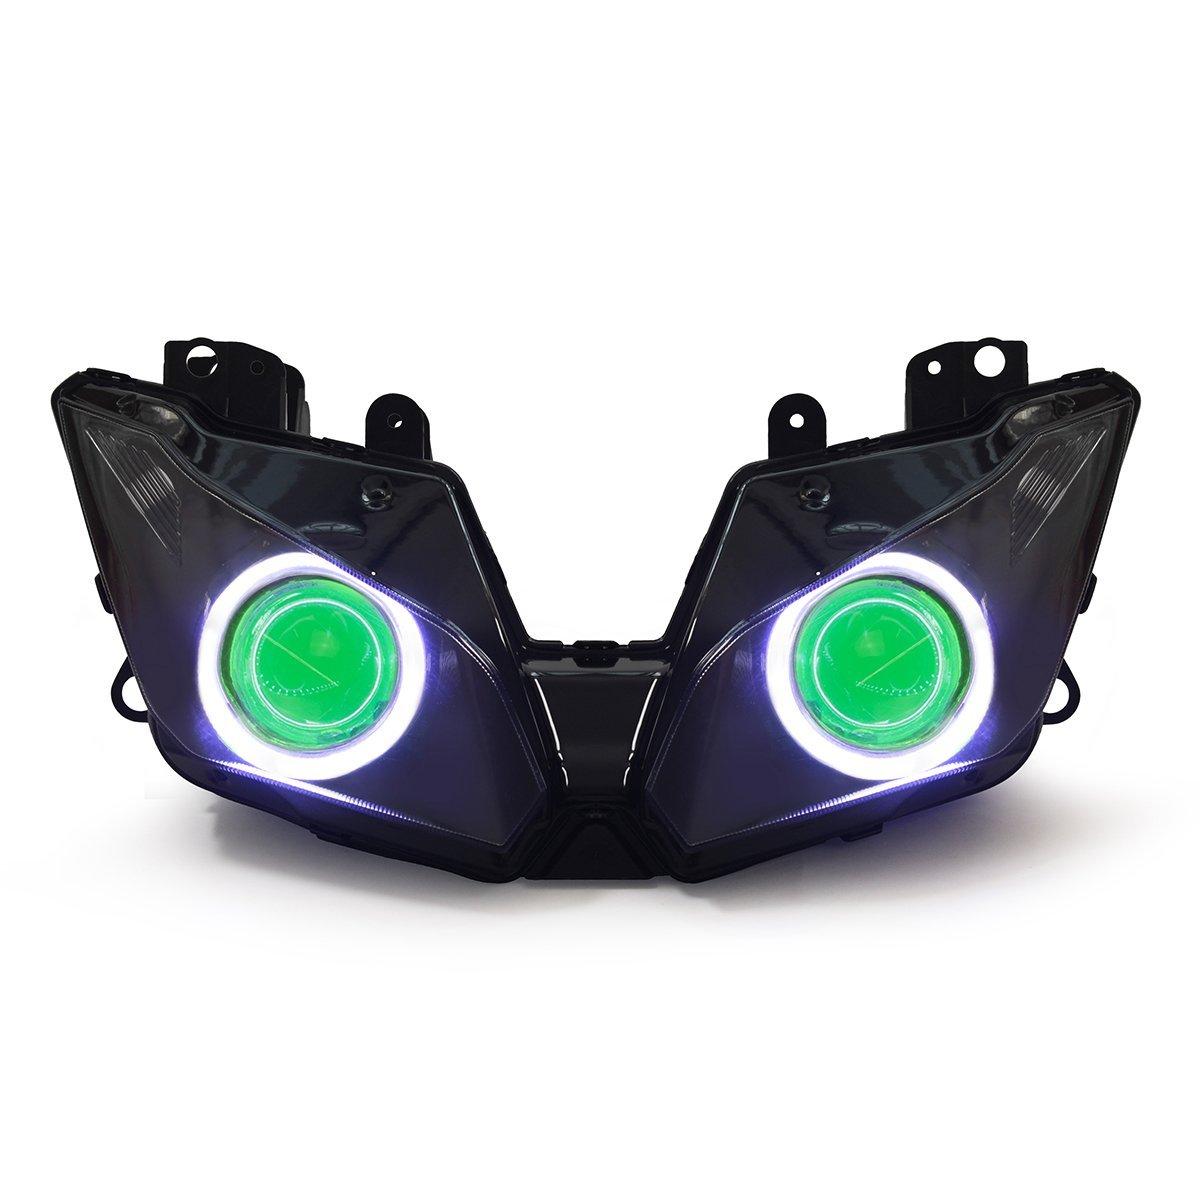 Buy Kt Led Angel Eye Headlight Assembly For Kawasaki Ninja 300 Green 250 2013 2017 V1